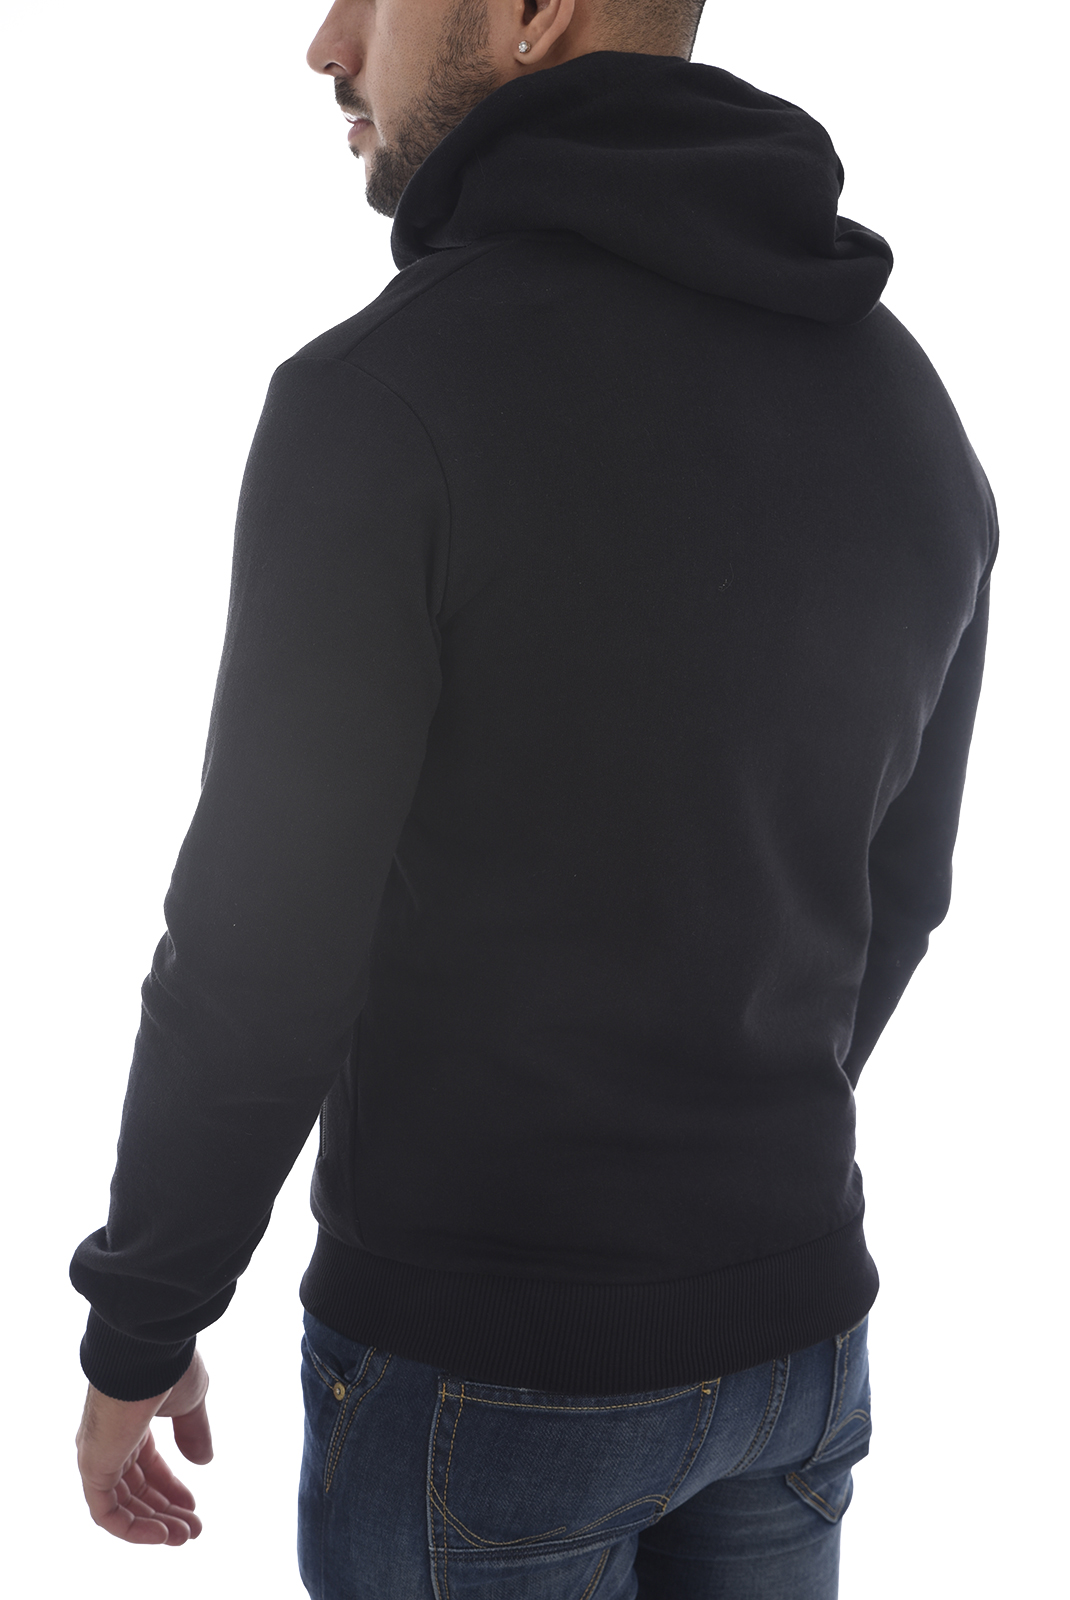 Sweatshirts  Goldenim paris 1101 NOIR